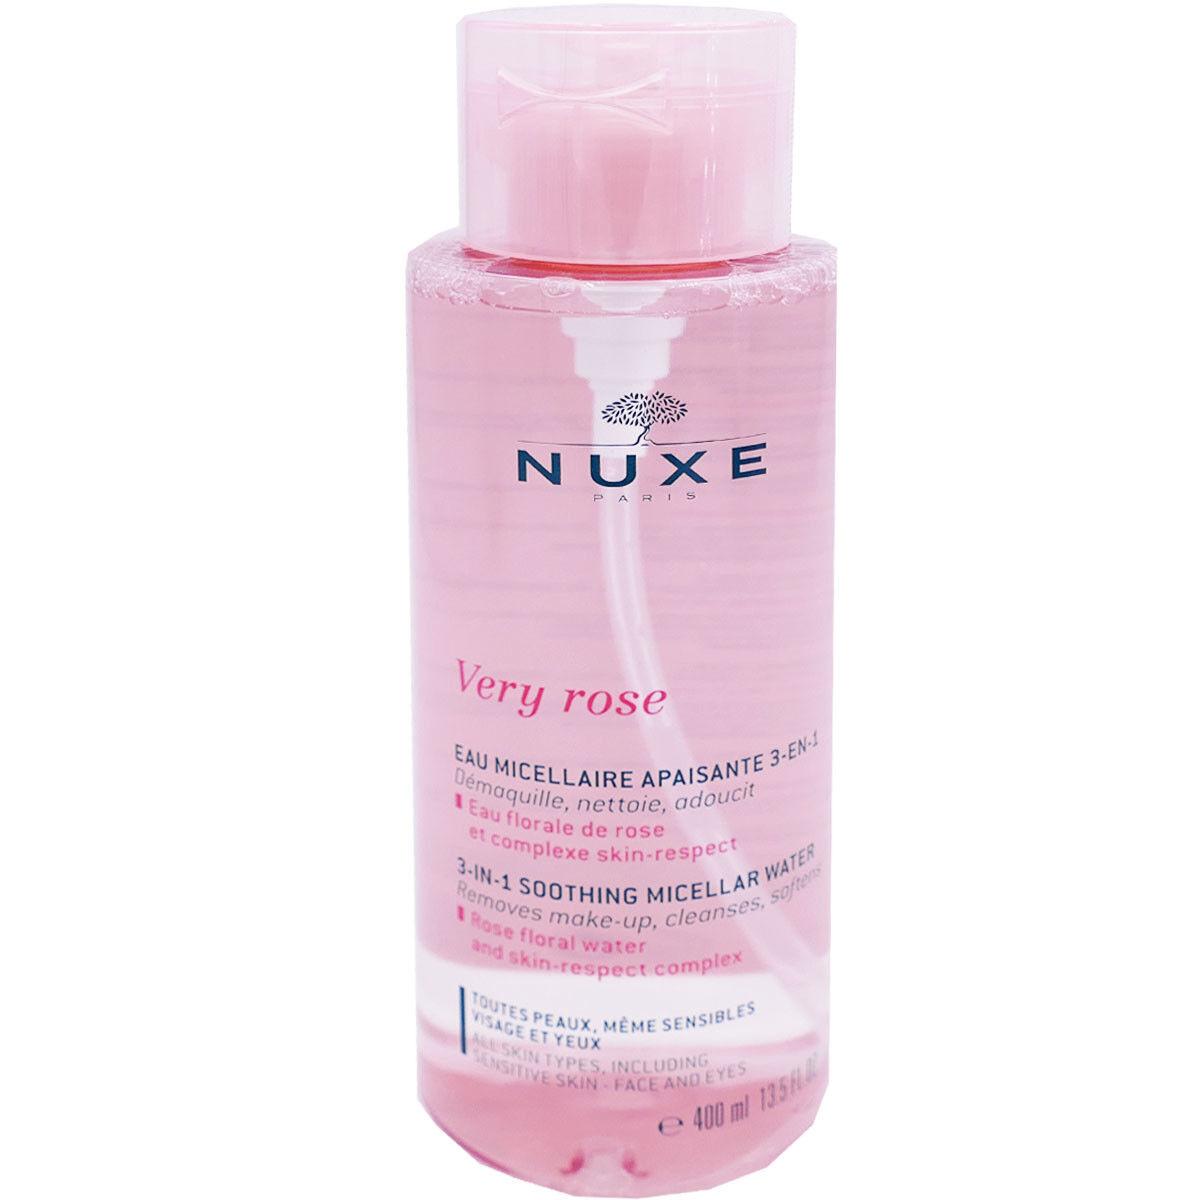 Nuxe very rose eau micellaire 400 ml apaisante